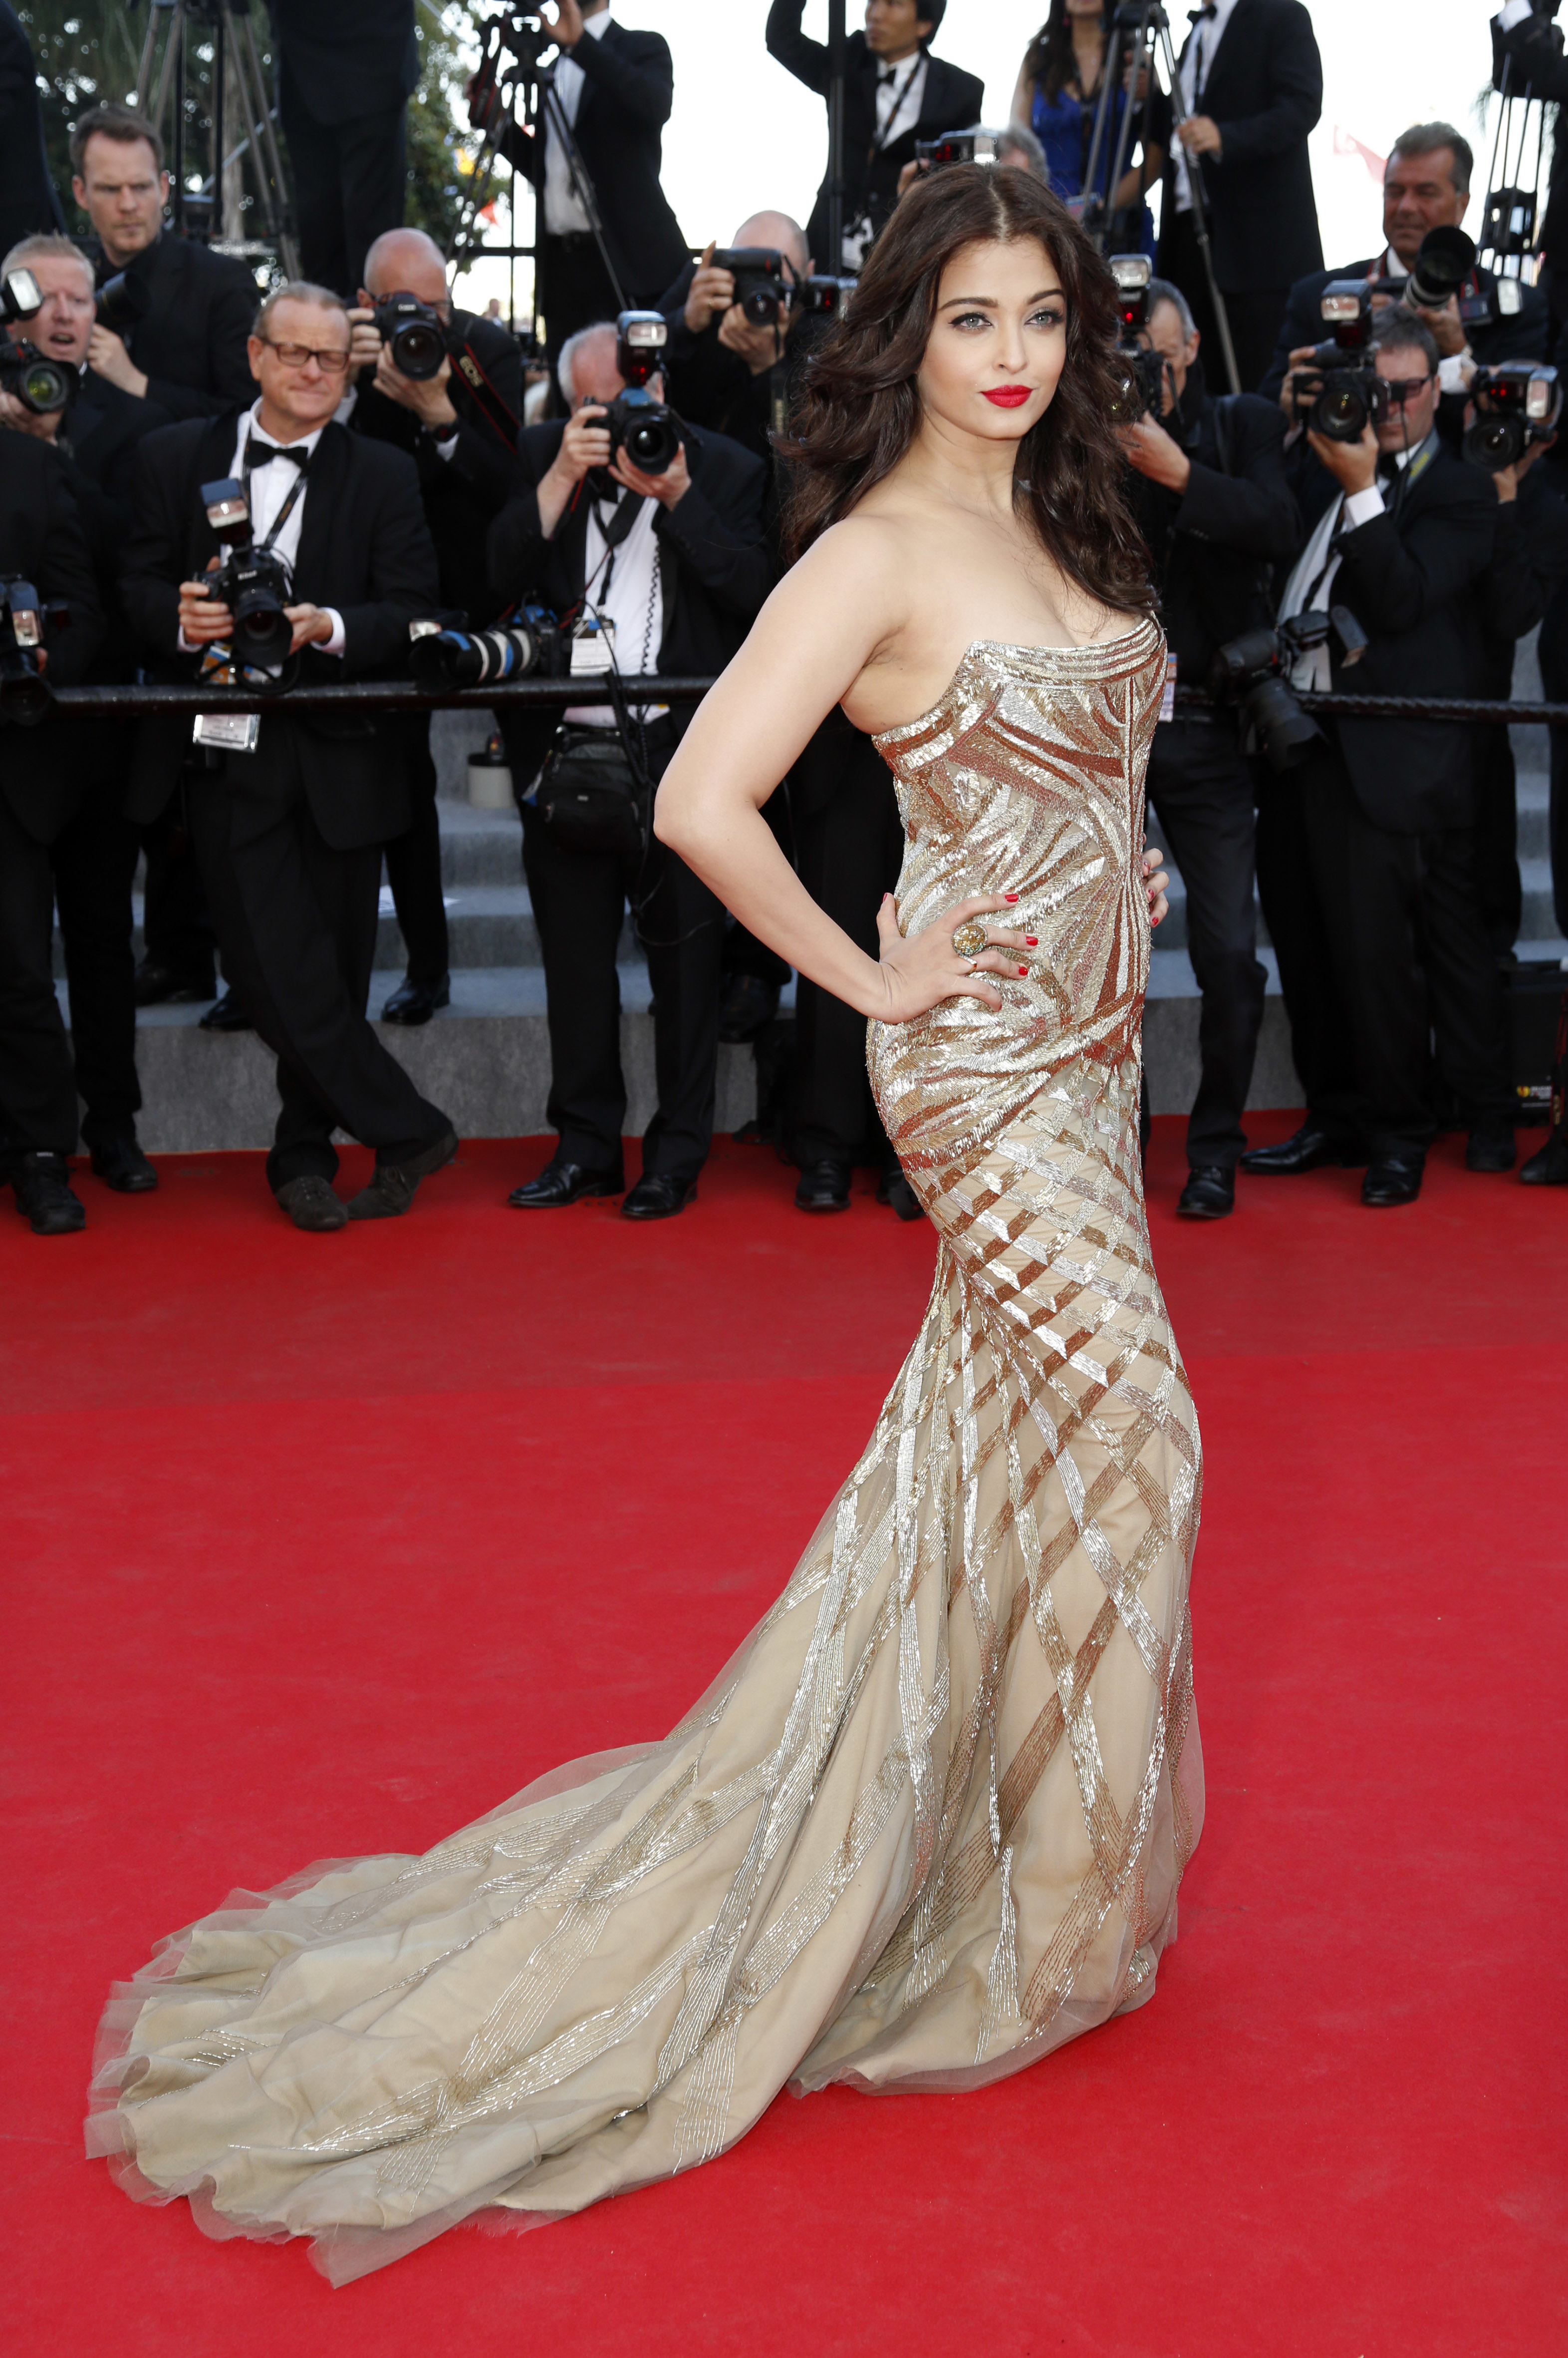 Cannes Film Festival - 'Two Days, One Night' (Deux Jours, Une Nuit) - Premiere